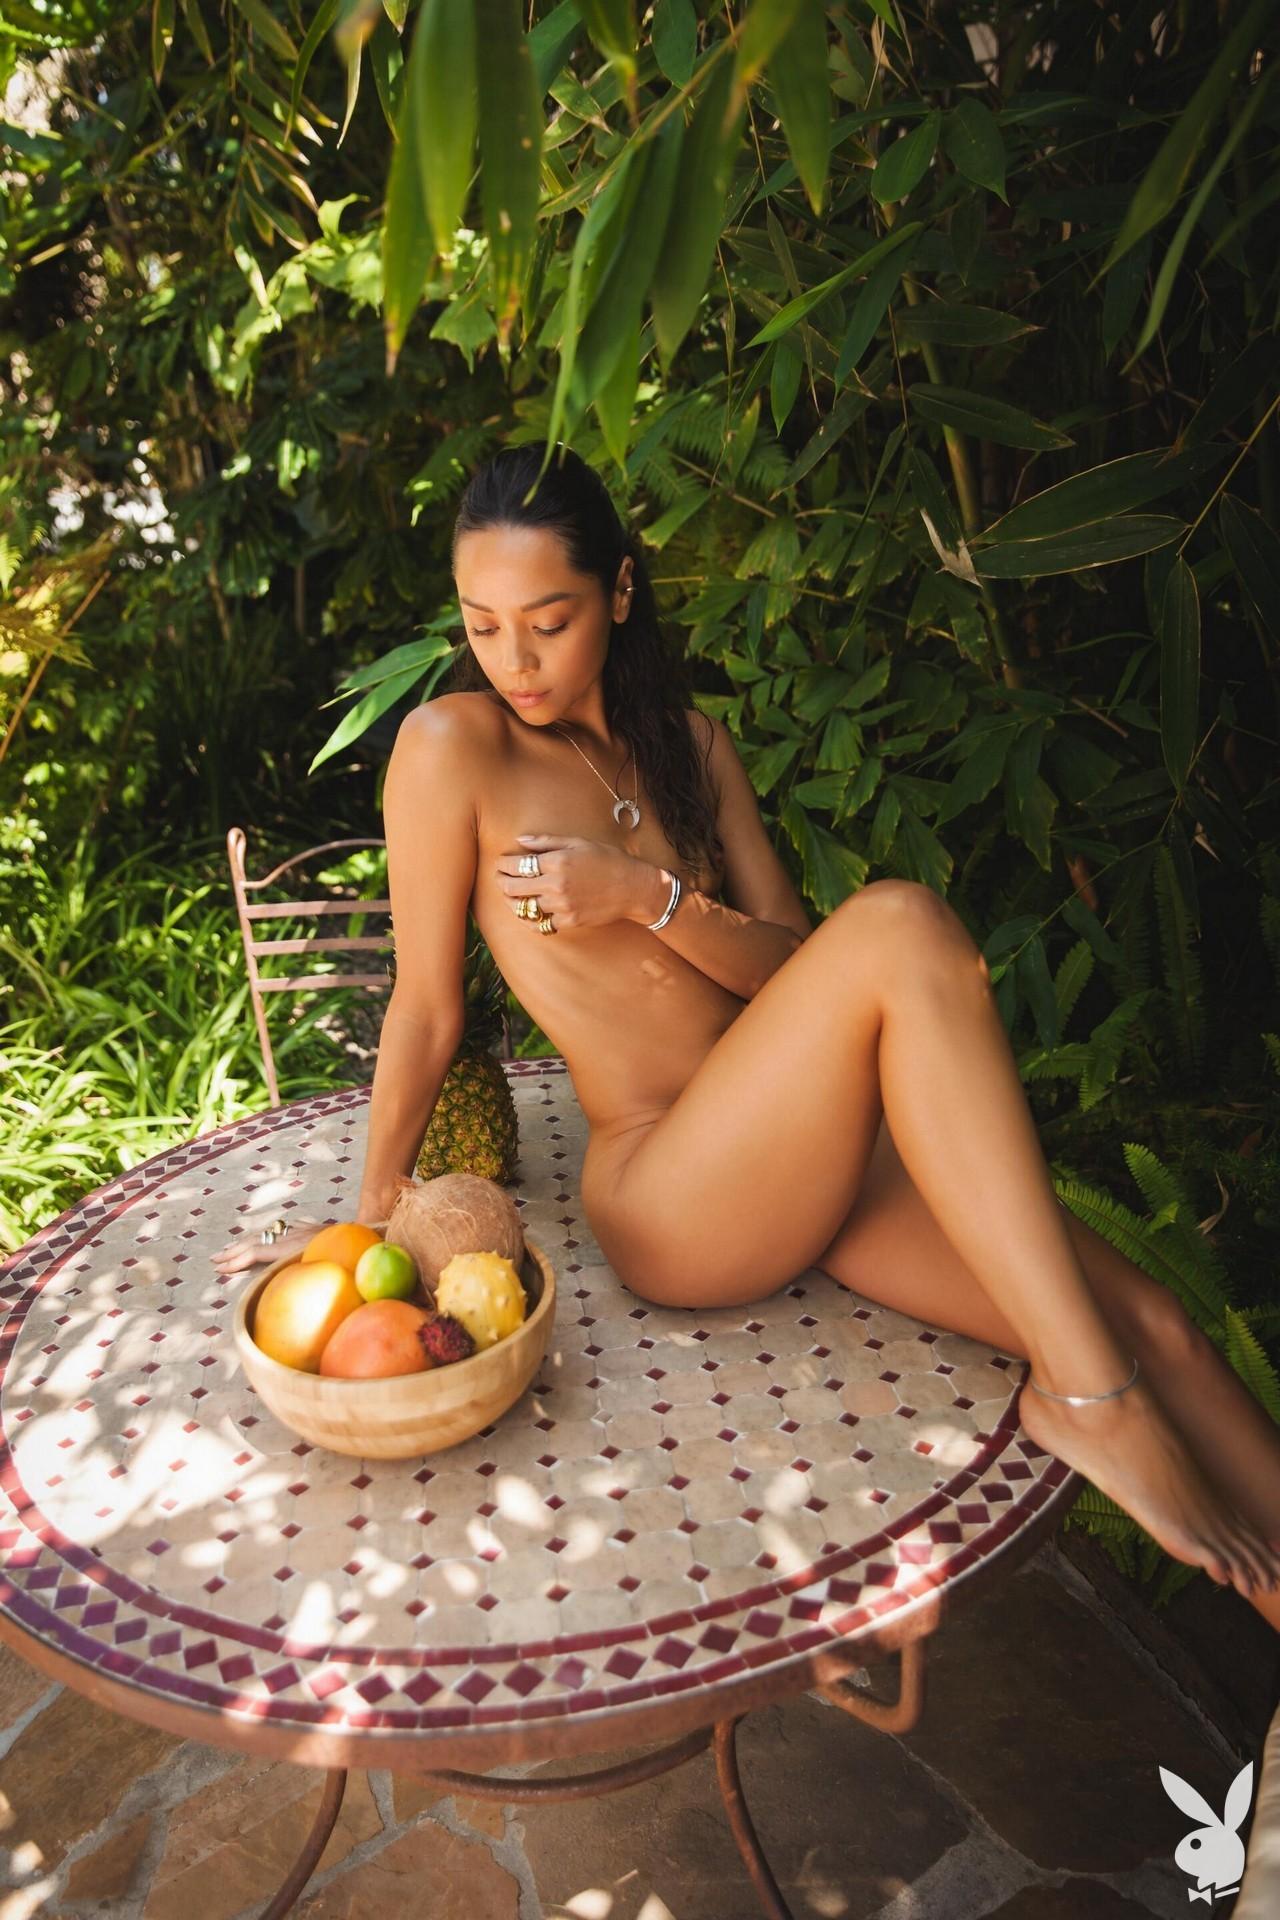 Playmate September 2020 Danielle Alcaraz Playboy Plus (25)